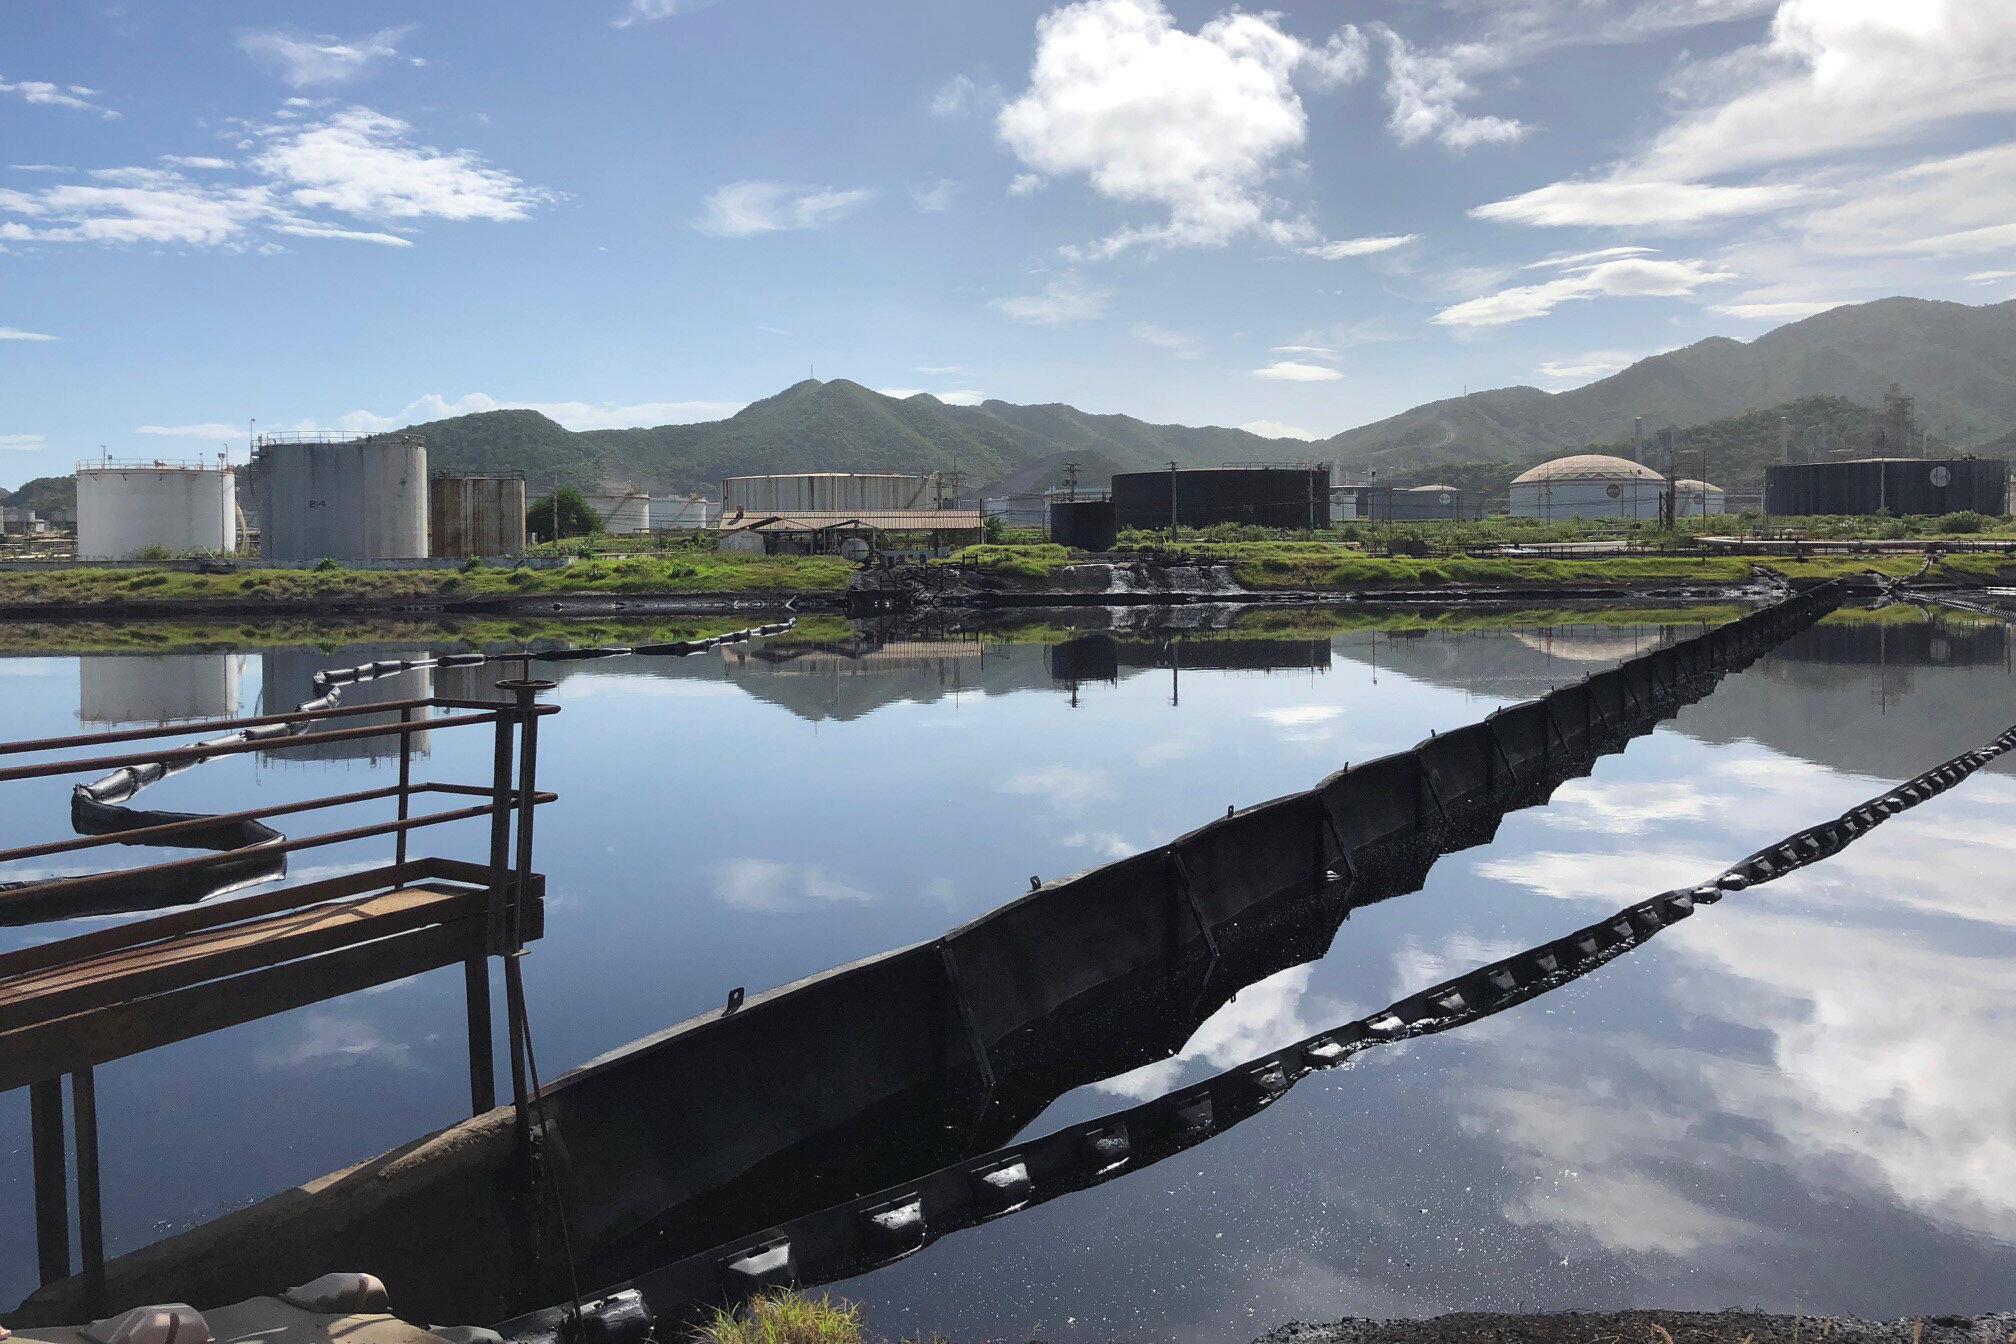 Nhà máy lọc dầu ở Puerto La Cruz, Venezuela. Ảnh 18/07/2018.